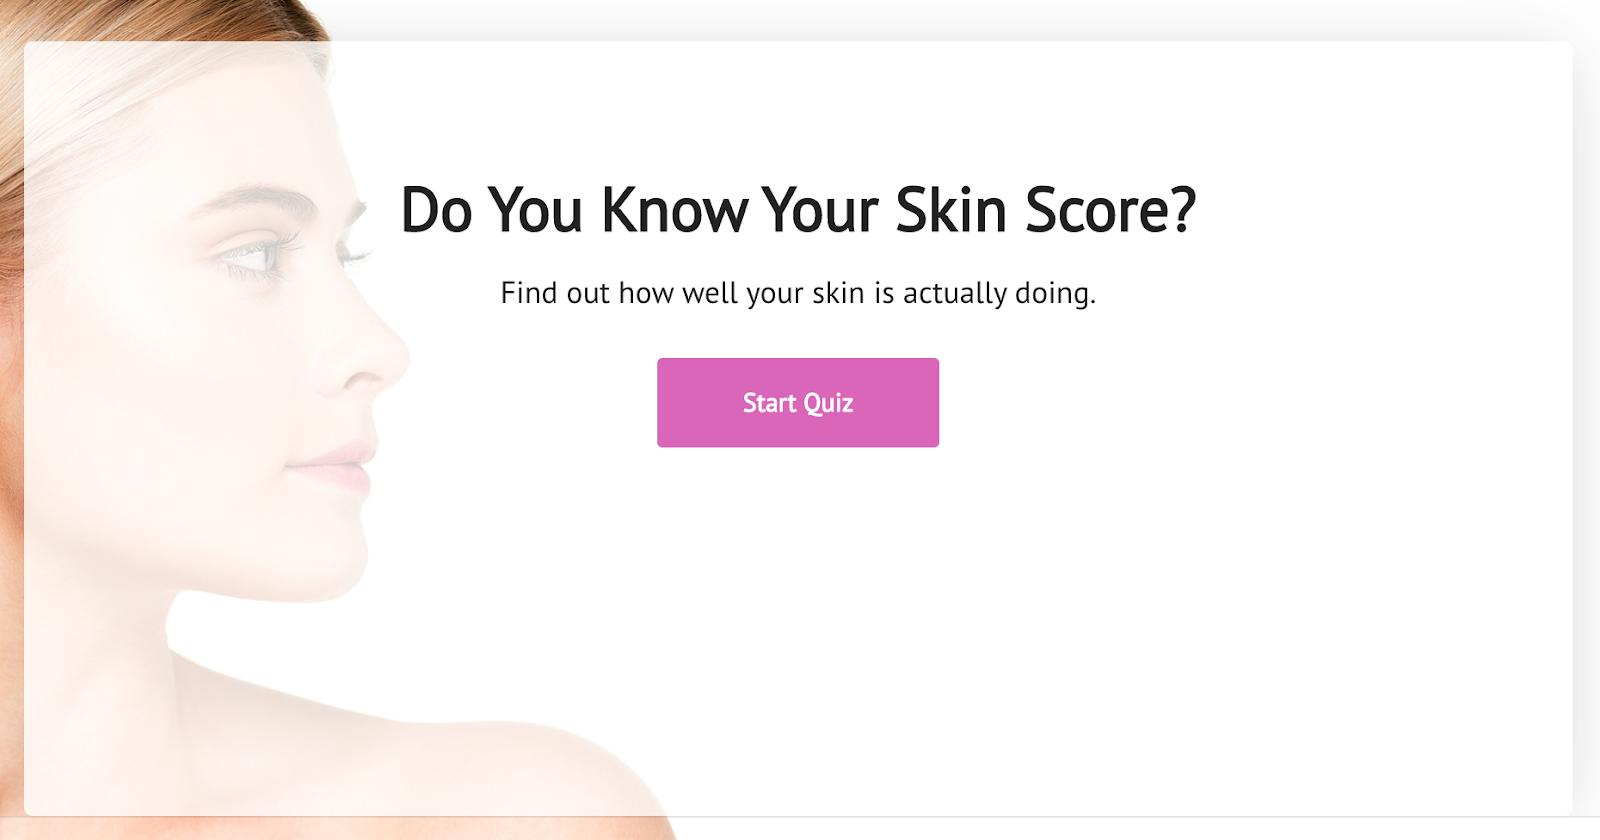 Skin Score quiz